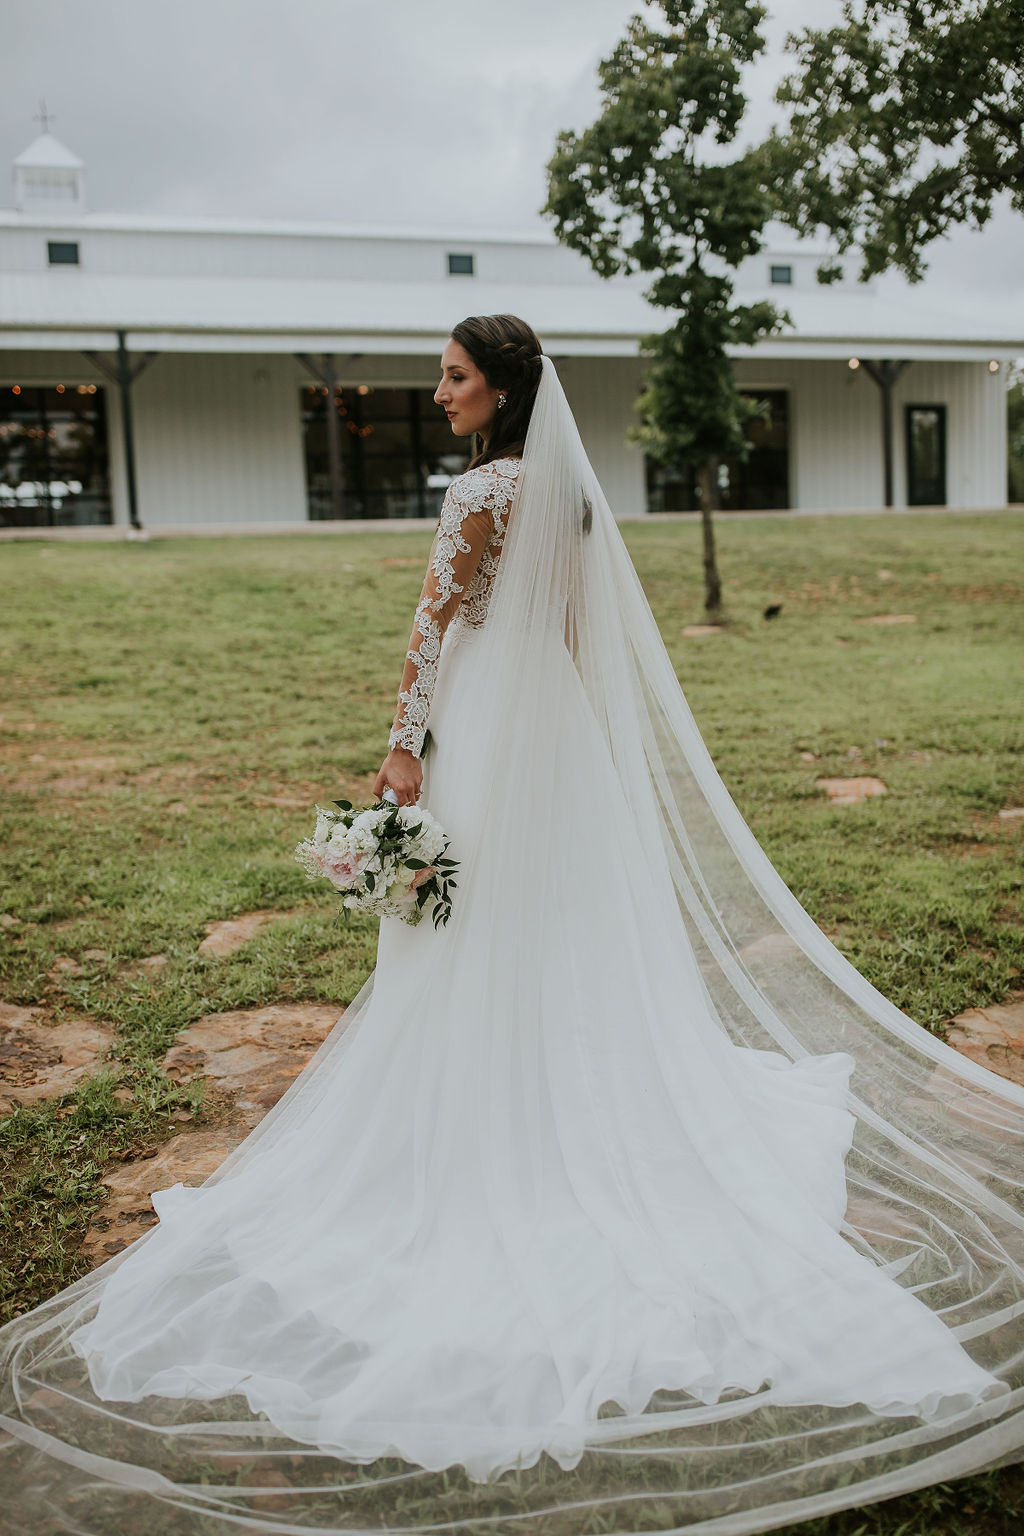 Bright light white barn wedding venue with a view Tulsa Oklahoma 16.jpg